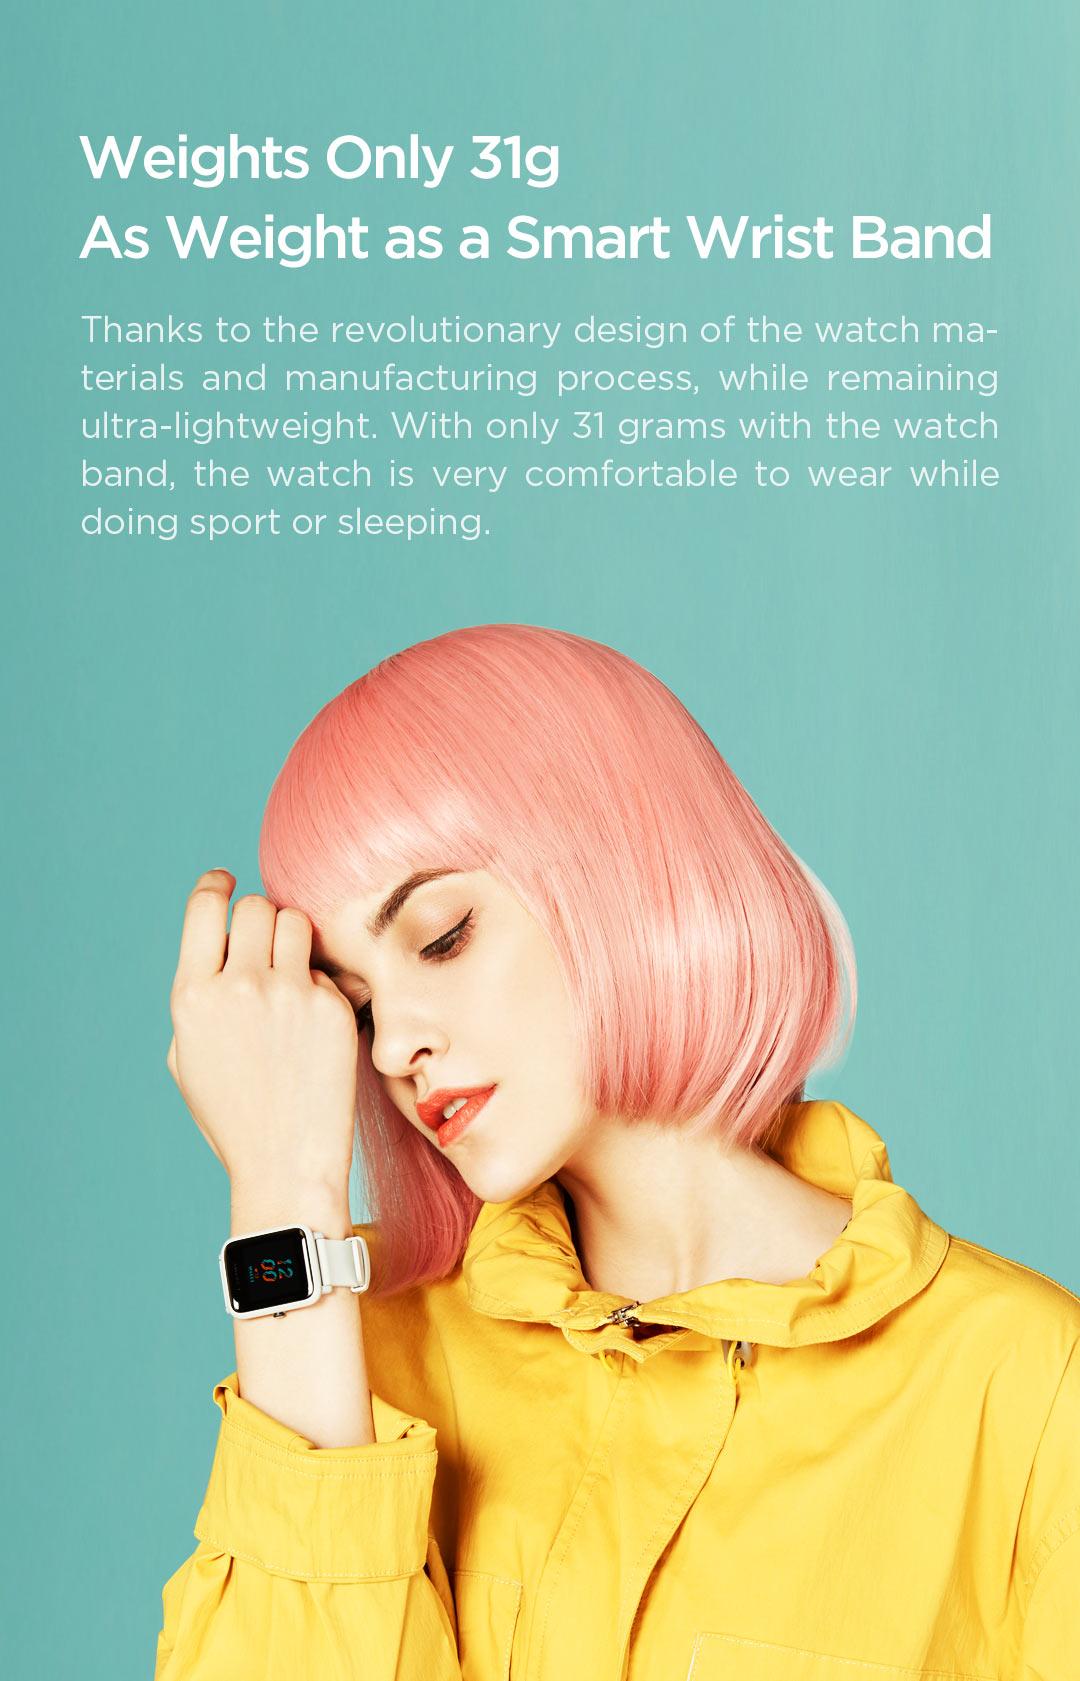 Hfa7bdcb89d59427290b07da4f9d0cda0z In Stock 2020 Global Amazfit Bip S Smartwatch 5ATM waterproof built in GPS GLONASS Smart Watch for Android iOS Phone